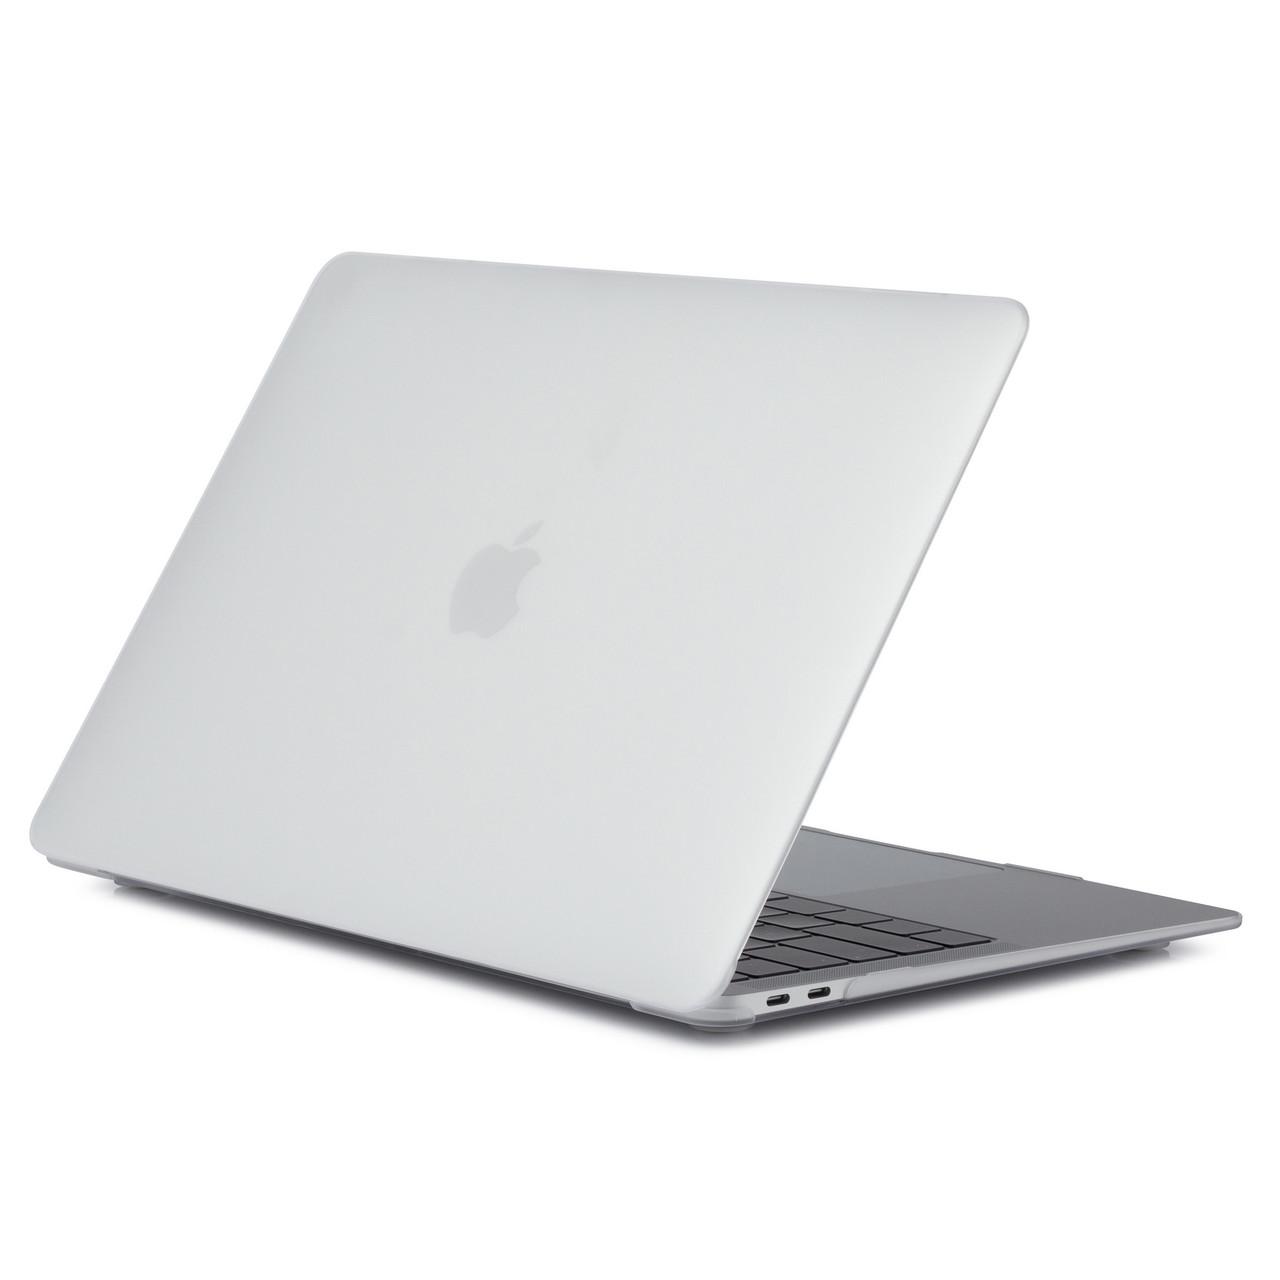 "Чохол пластикова накладка для макбук Apple Macbook Air Touch ID 13,3"" (A1932/A2179) - білий"